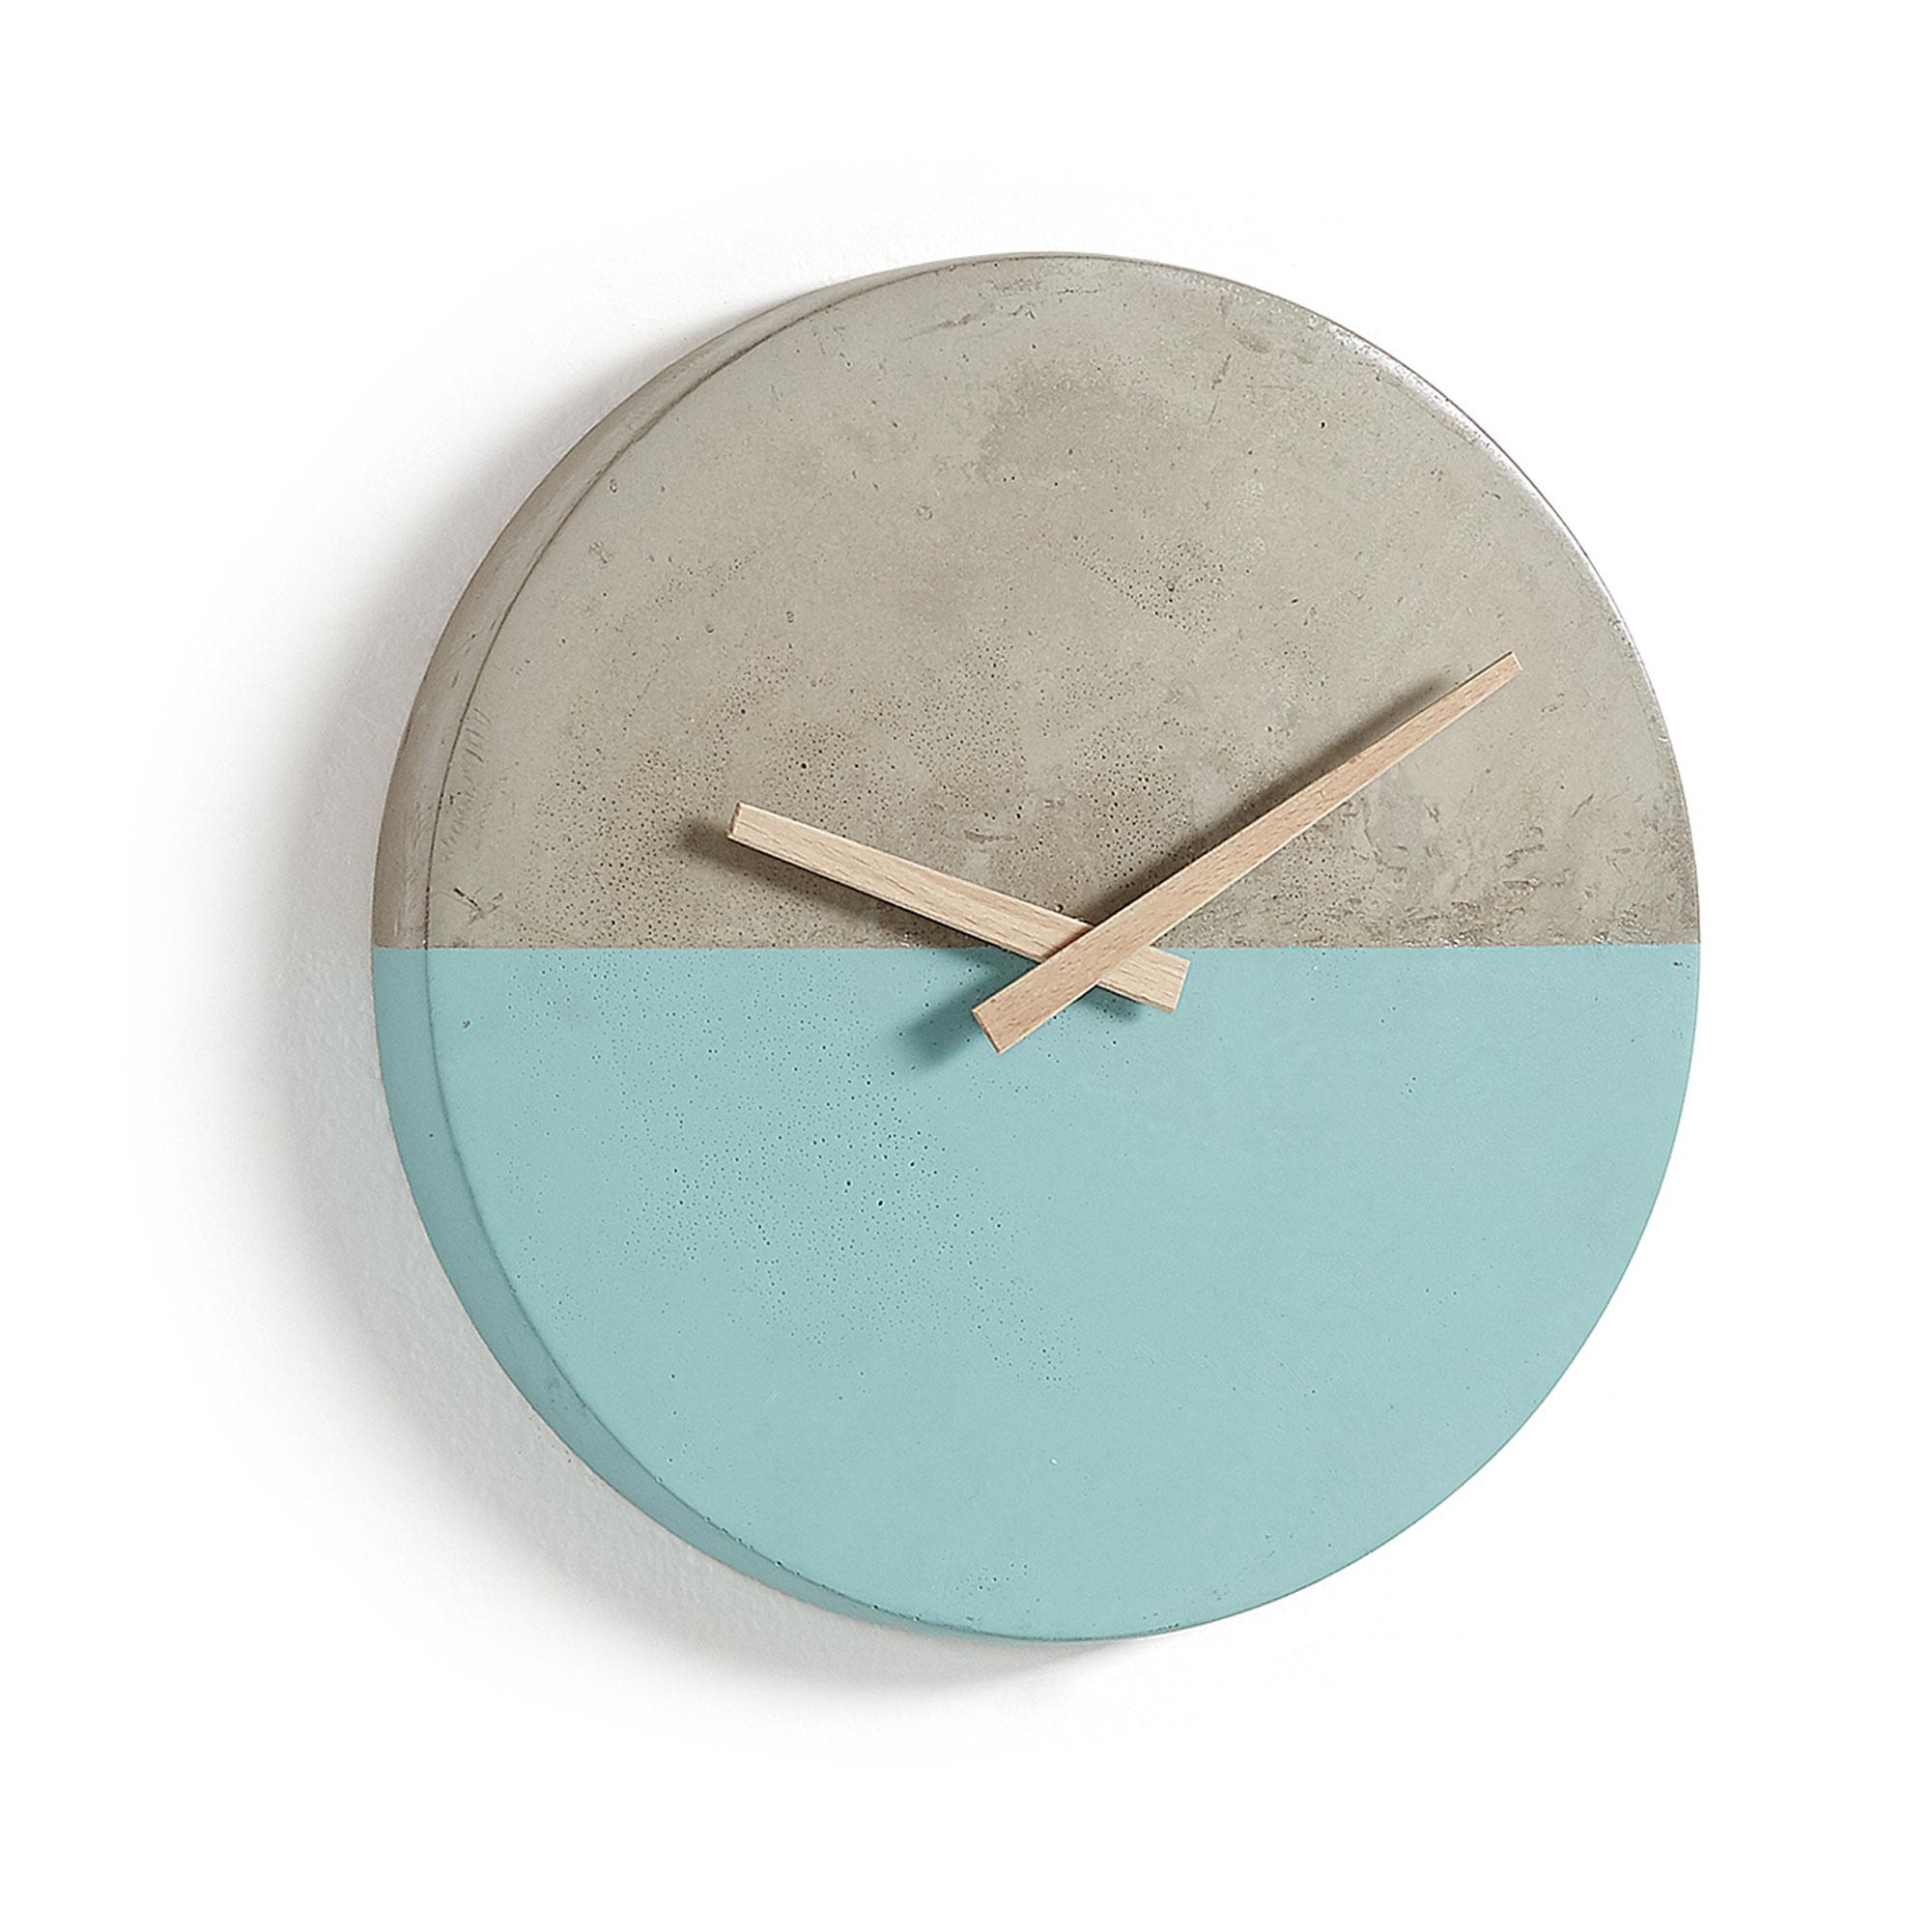 Kave Home - Lenny Wanduhr Ø 27 cm   Dekoration > Uhren > Wanduhren   Kave Home